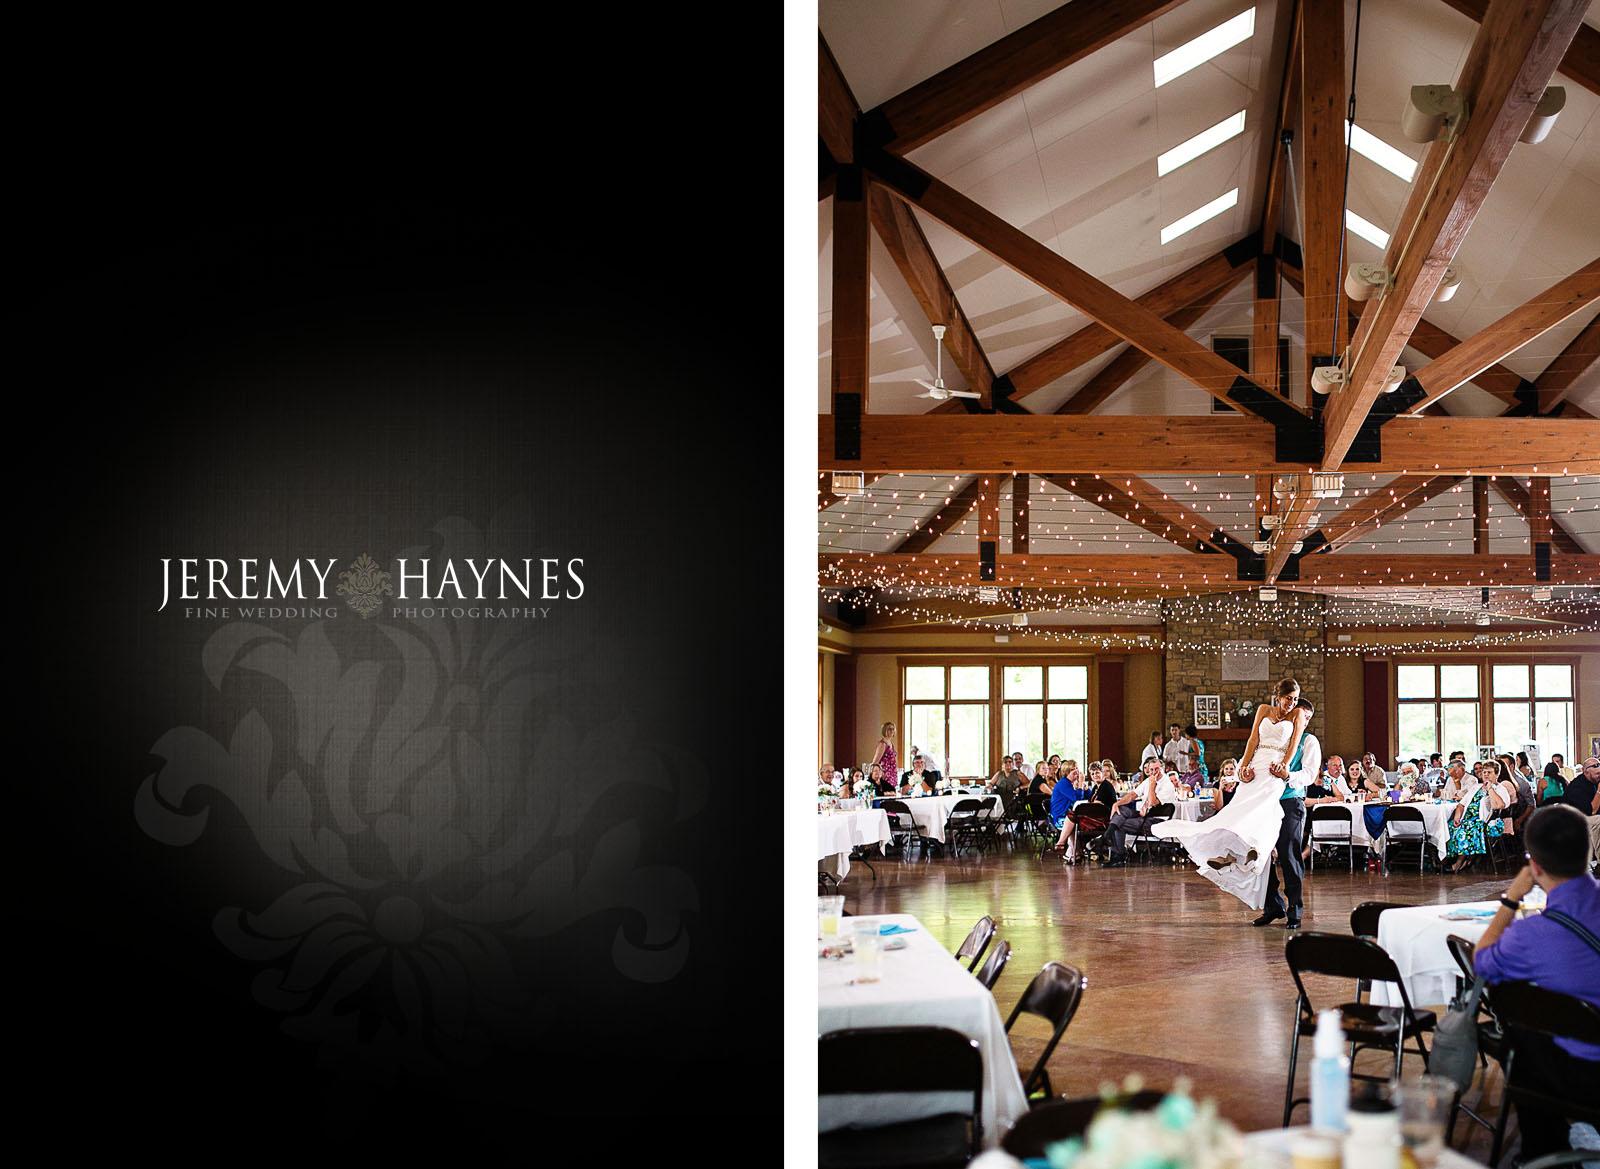 camp-kikthawenund-indanapolis-wedding-reception